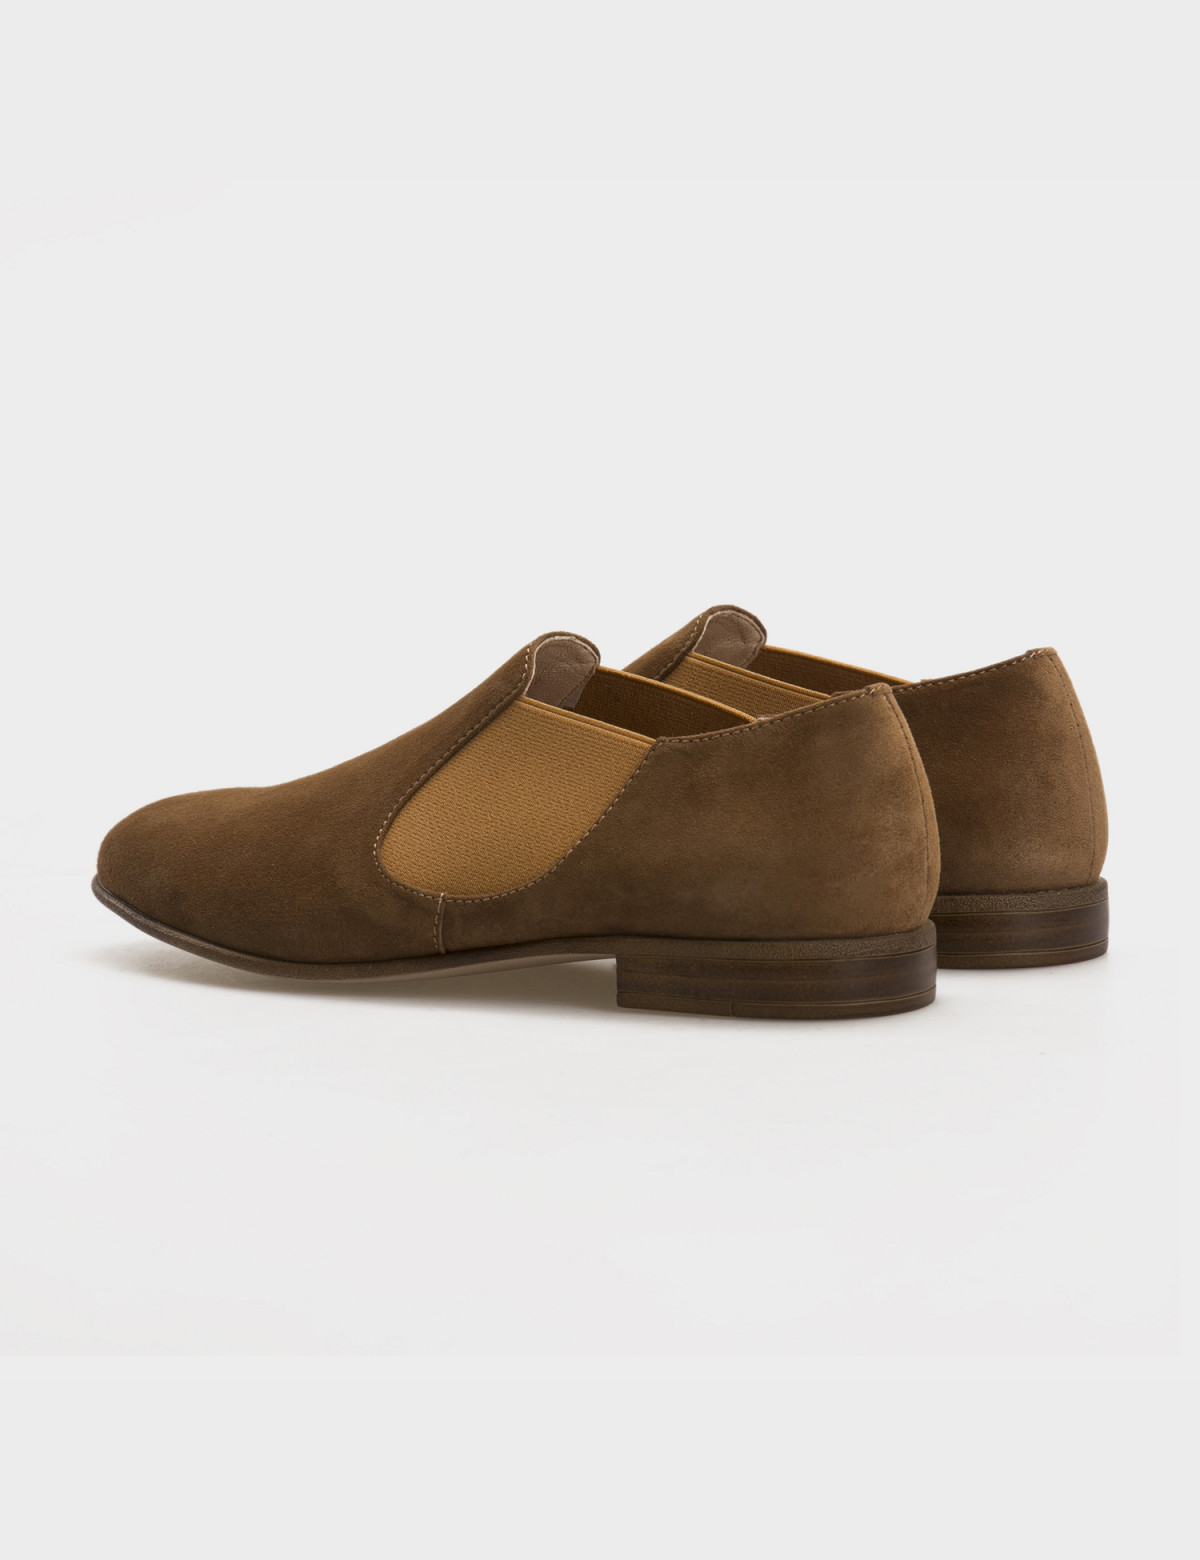 Туфли бежевые, натуральная замша2